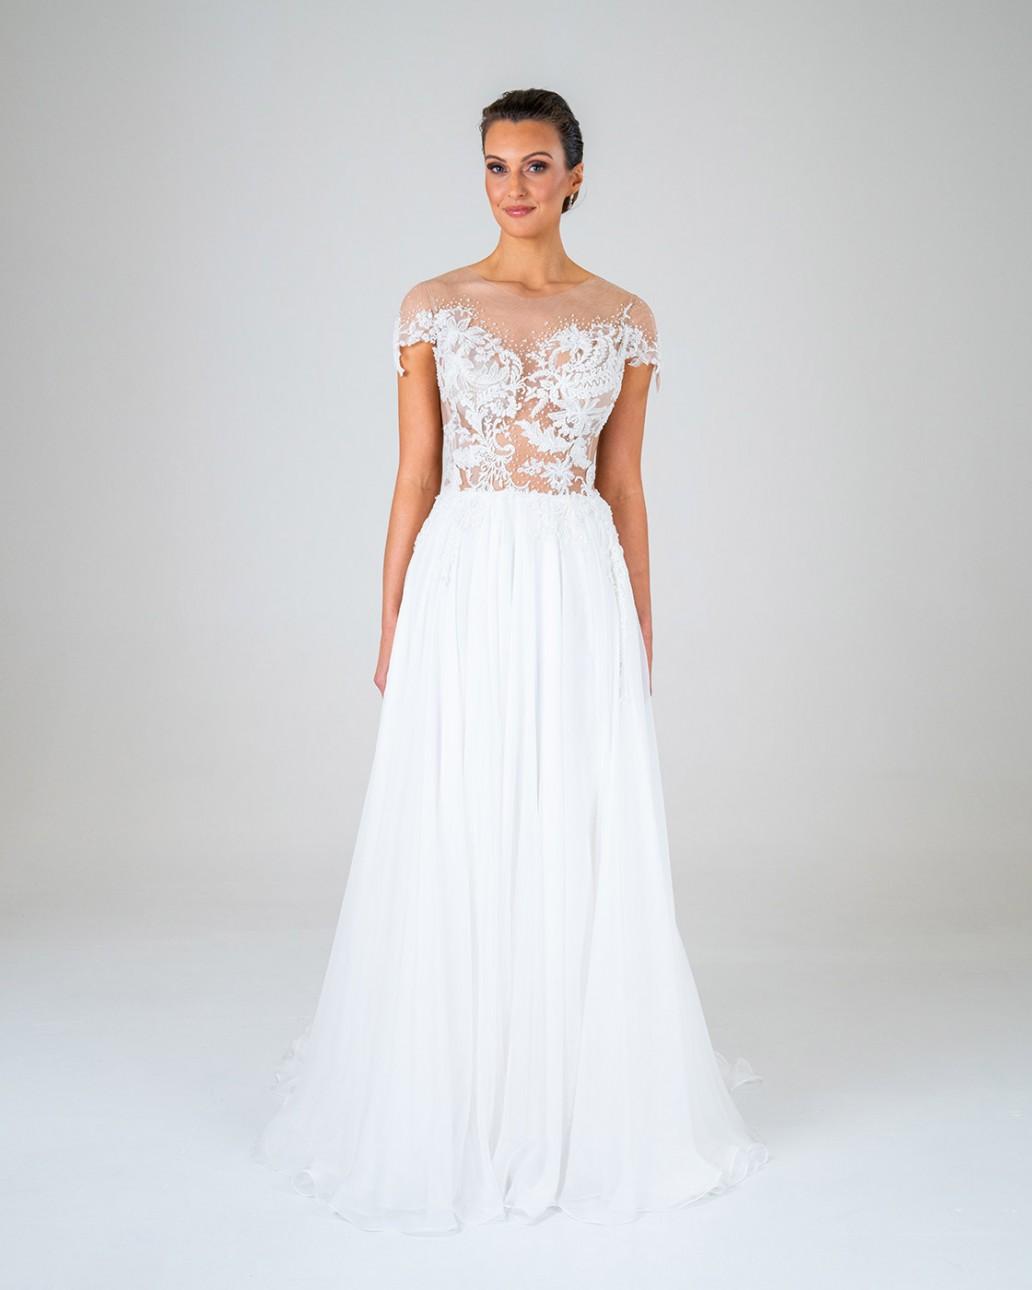 Marissa wedding dress front